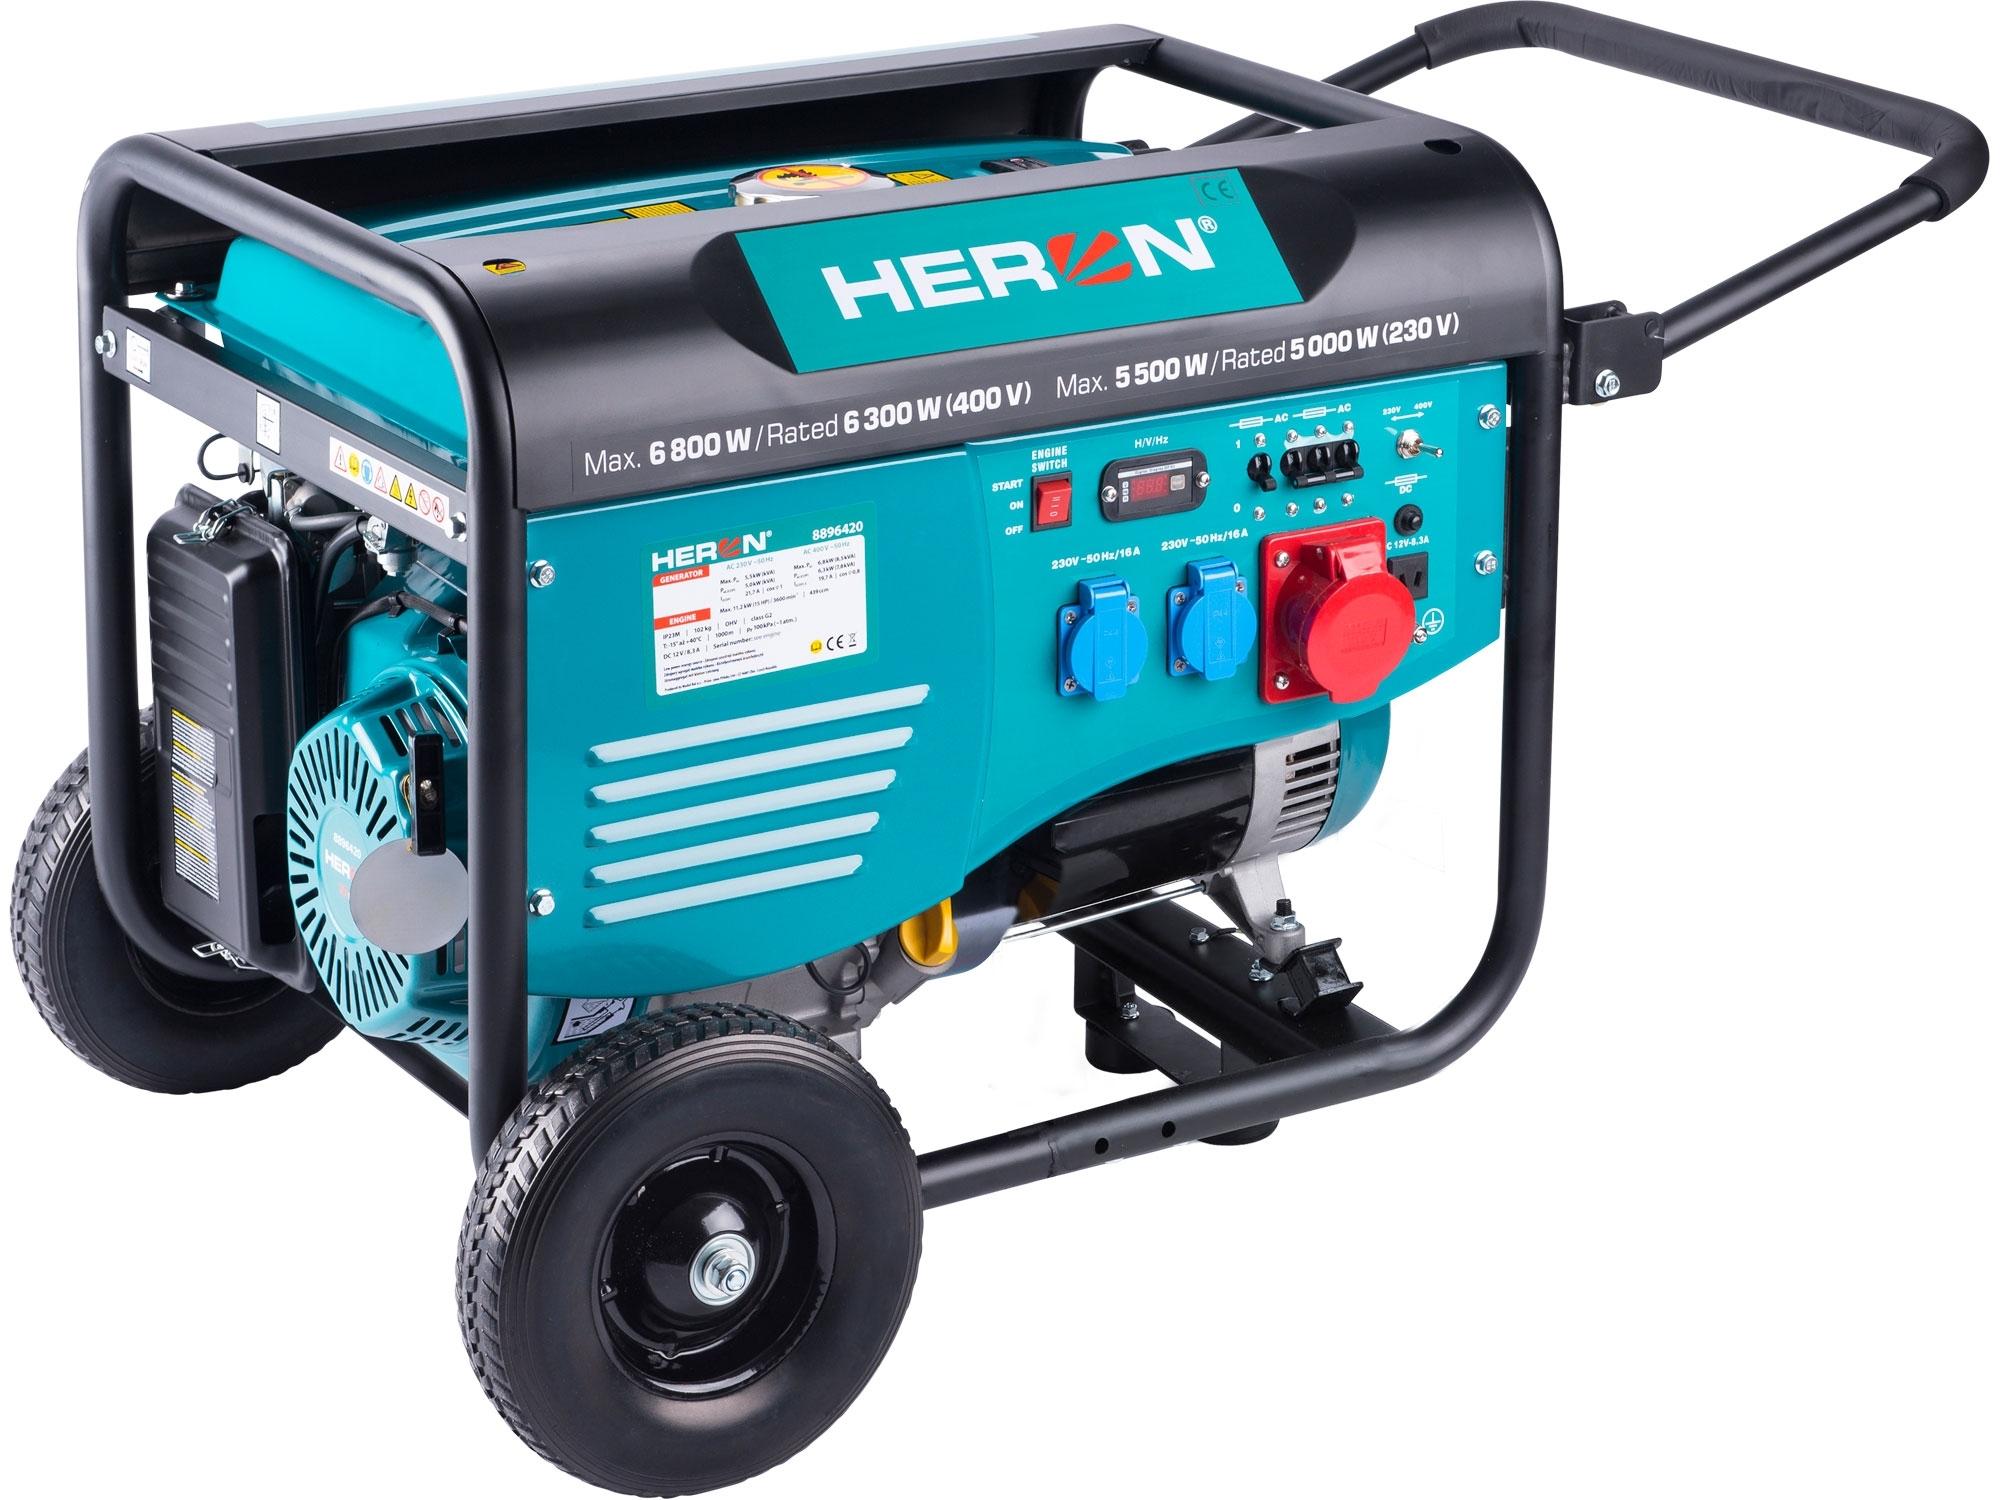 HERON elektrocentrála benzínová 15HP/6,8kW (400V), 5,5kW (230V), podvozek